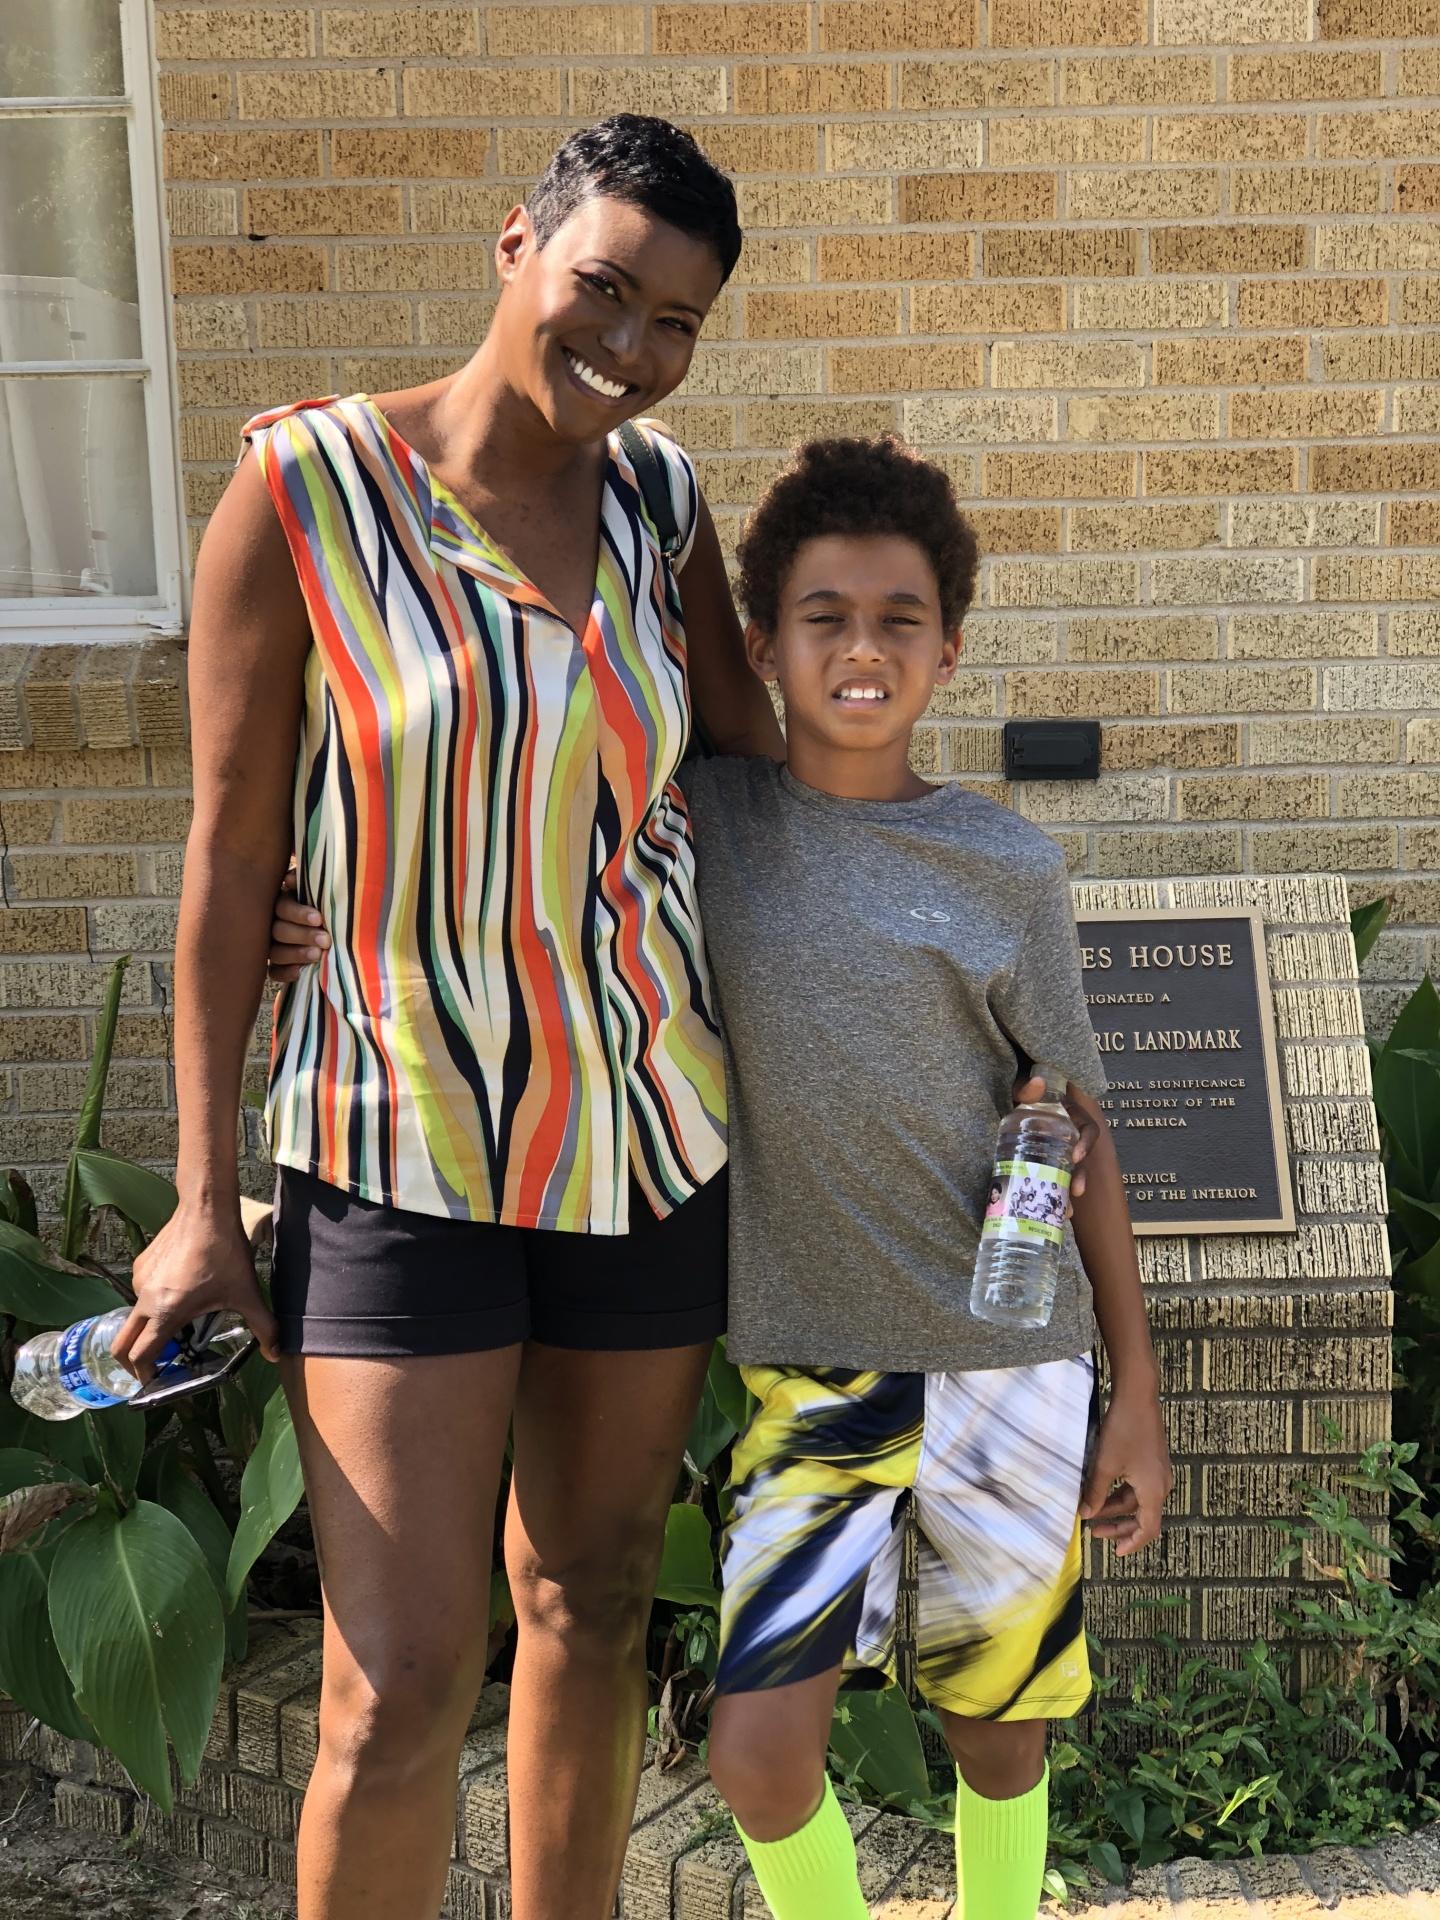 Hatchett's visit from TX_6- 2018